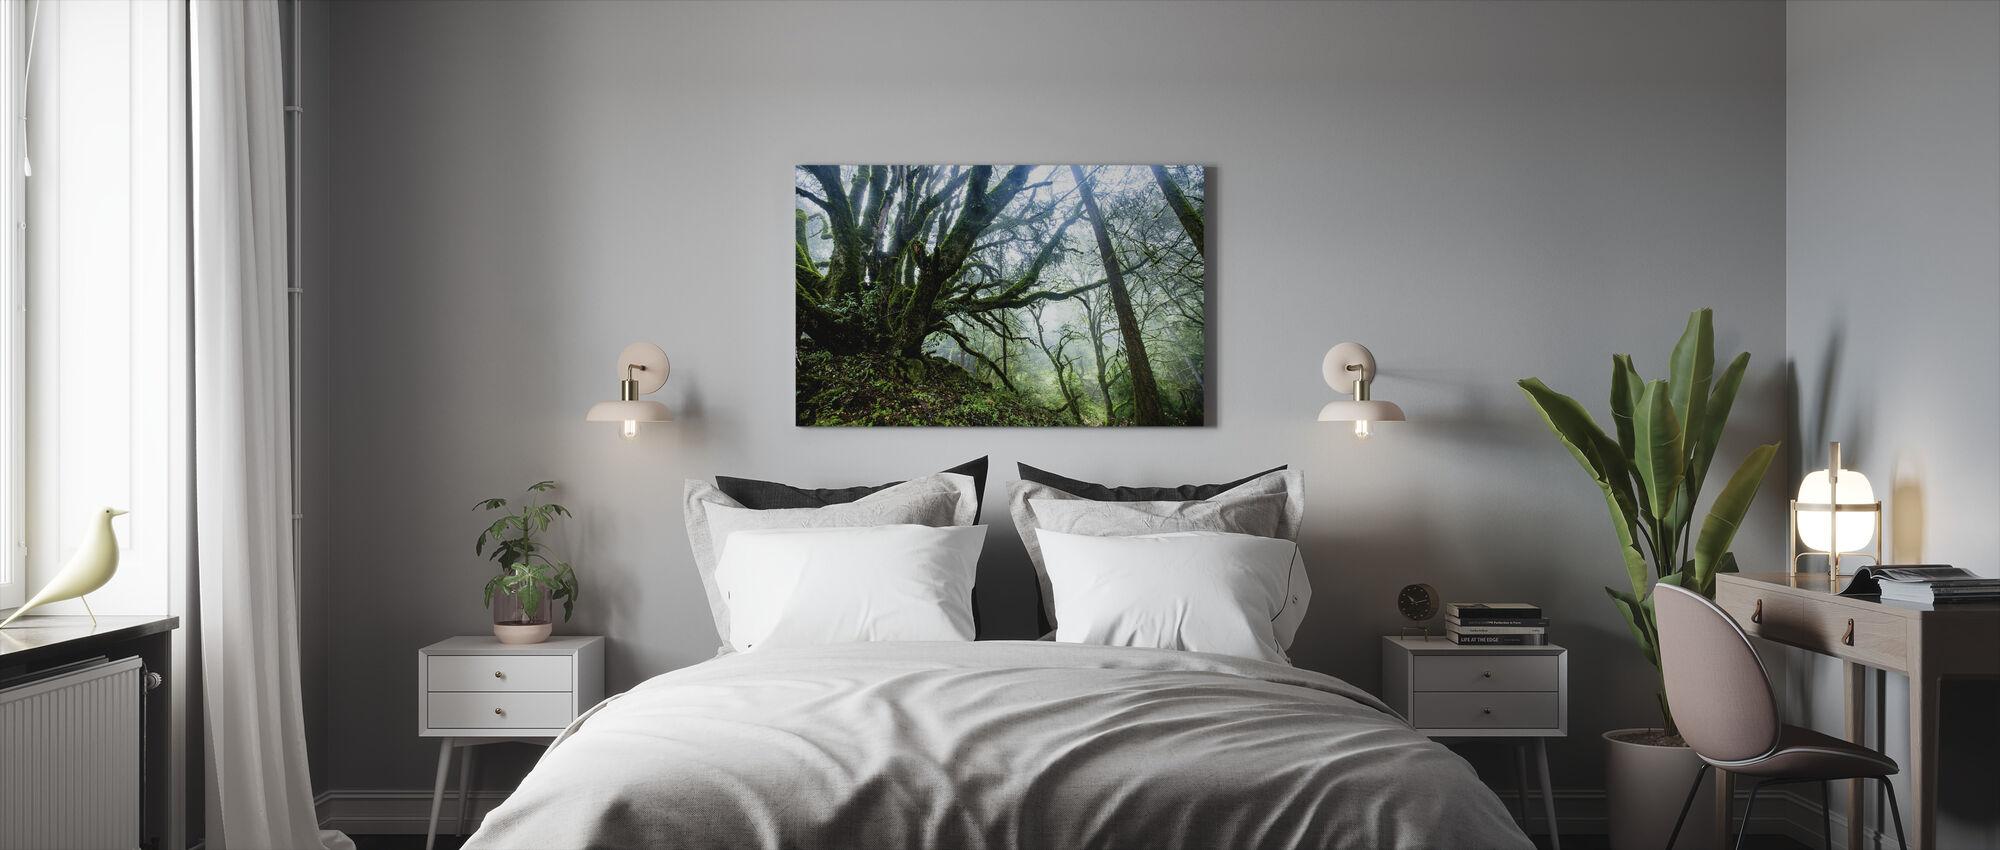 Sammal puu haara - Canvastaulu - Makuuhuone